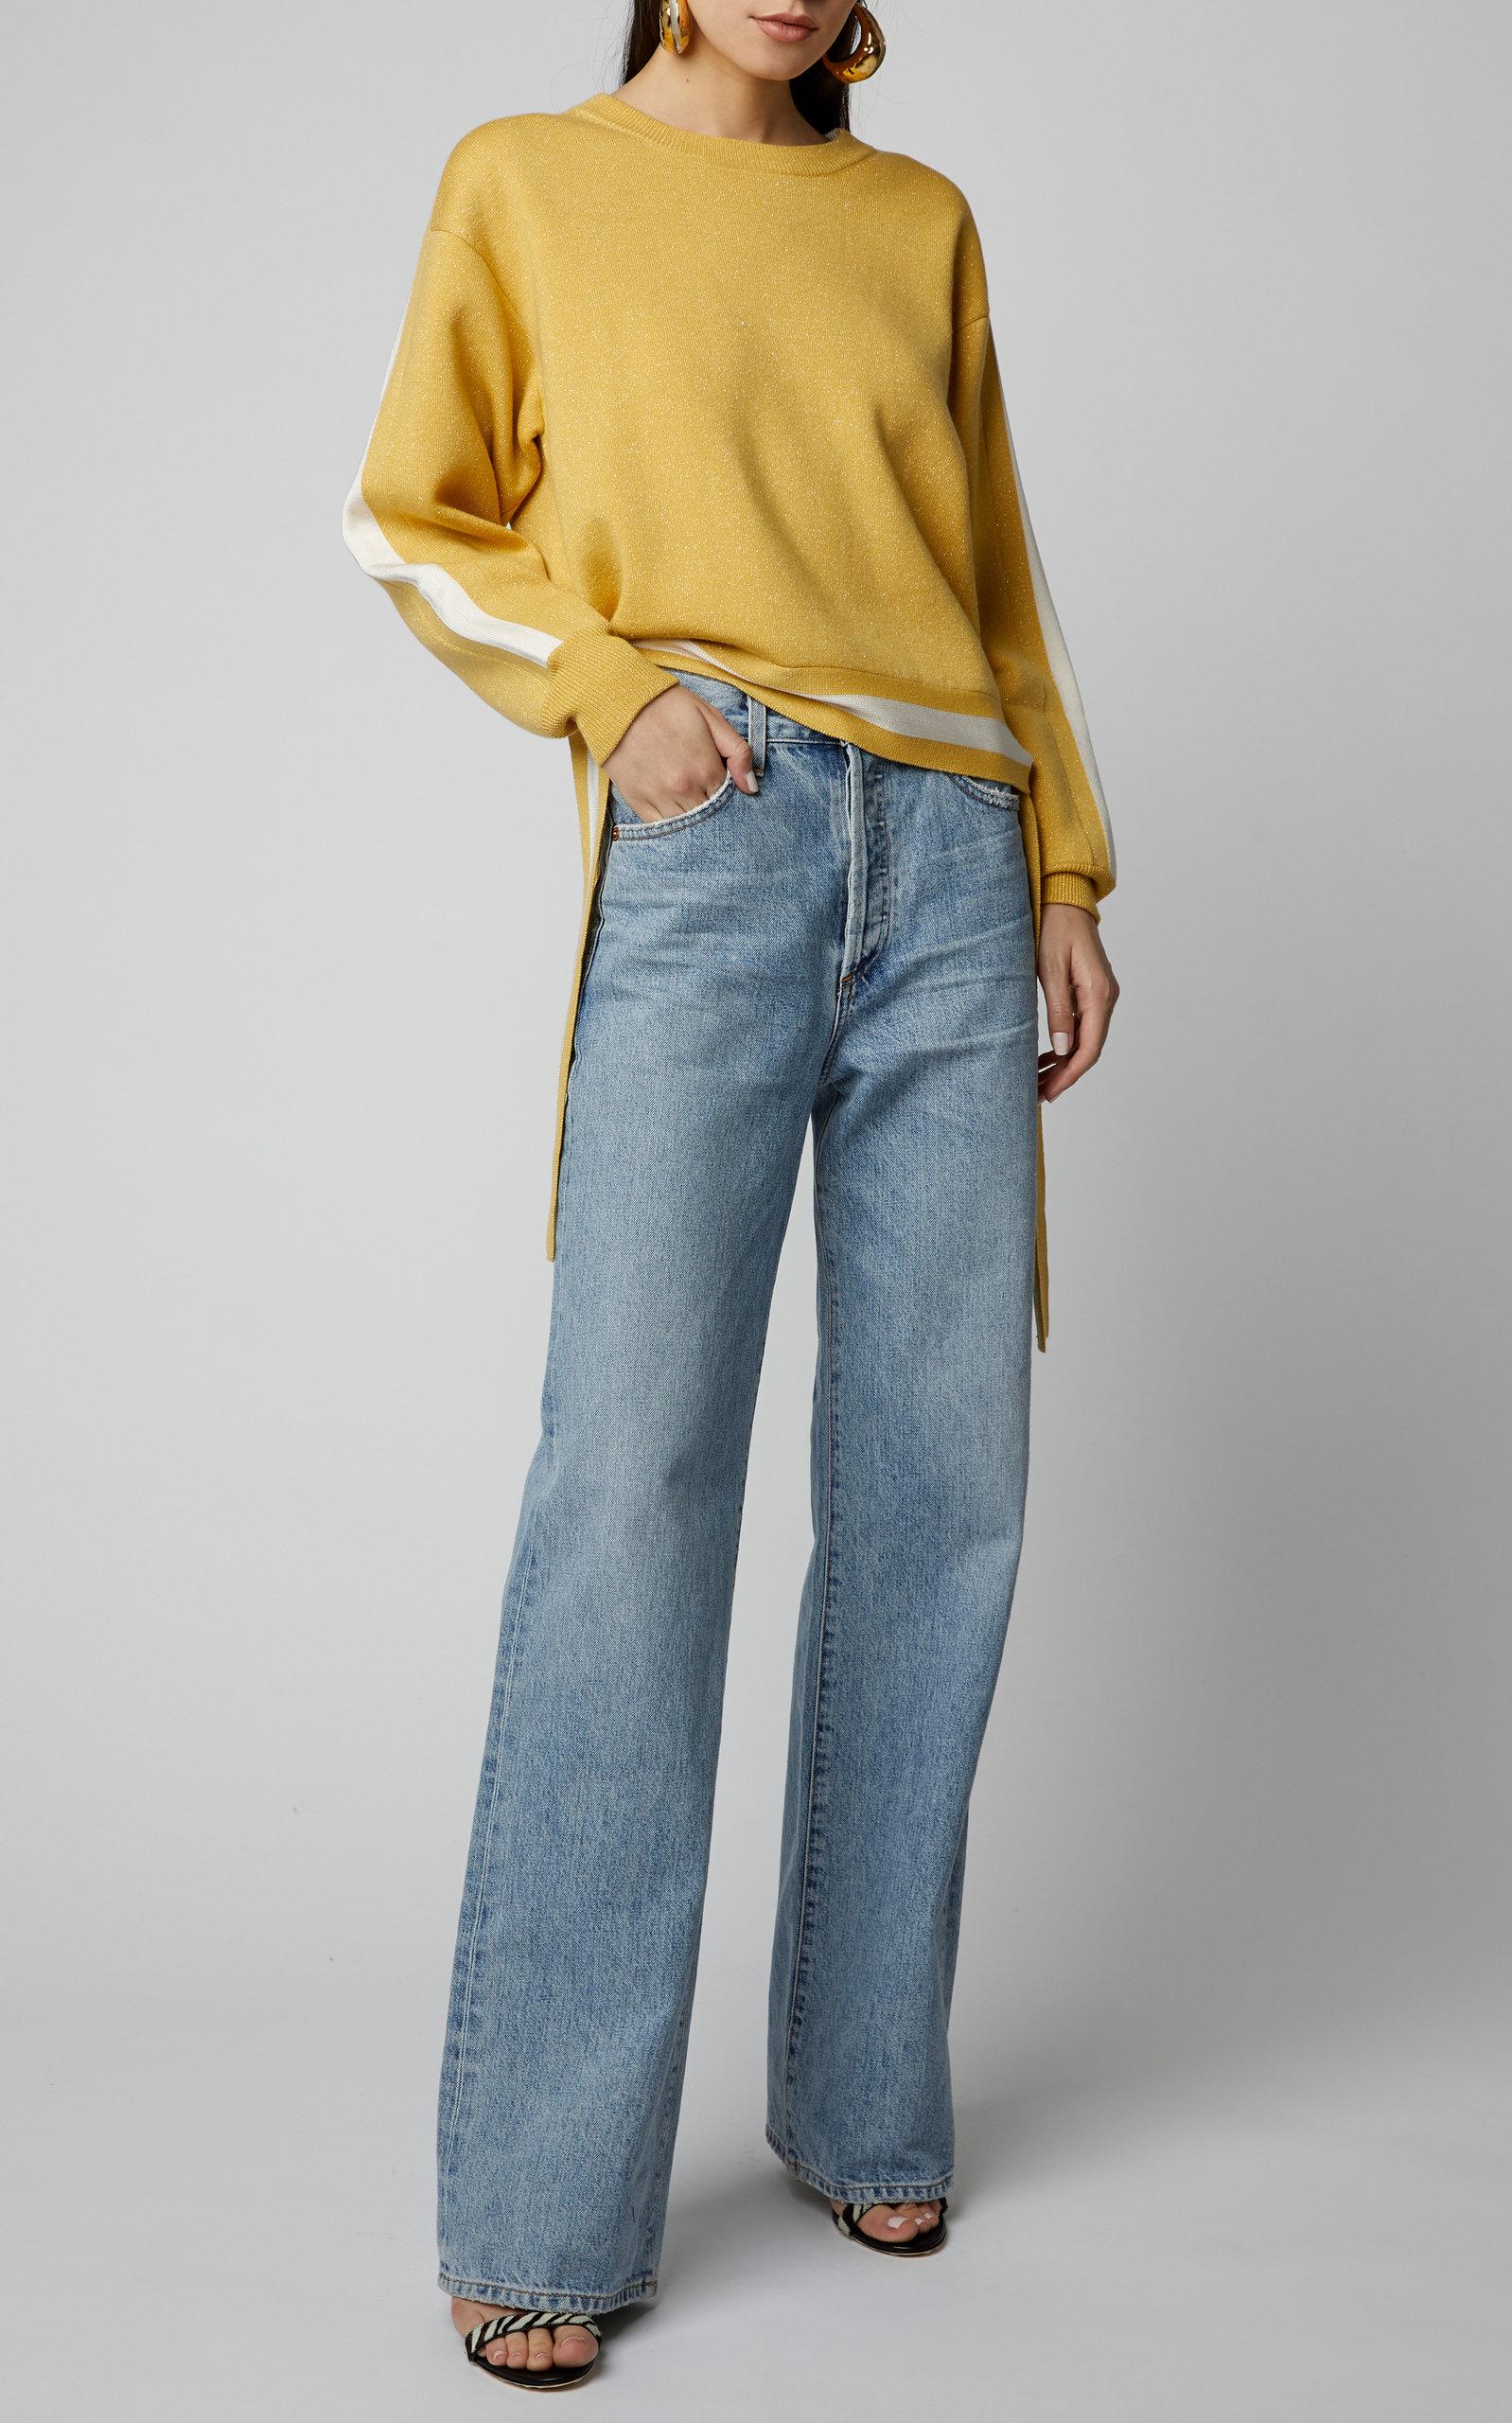 Grosgrain Trimmed Merino Blend Sweater By Lapointe | Moda